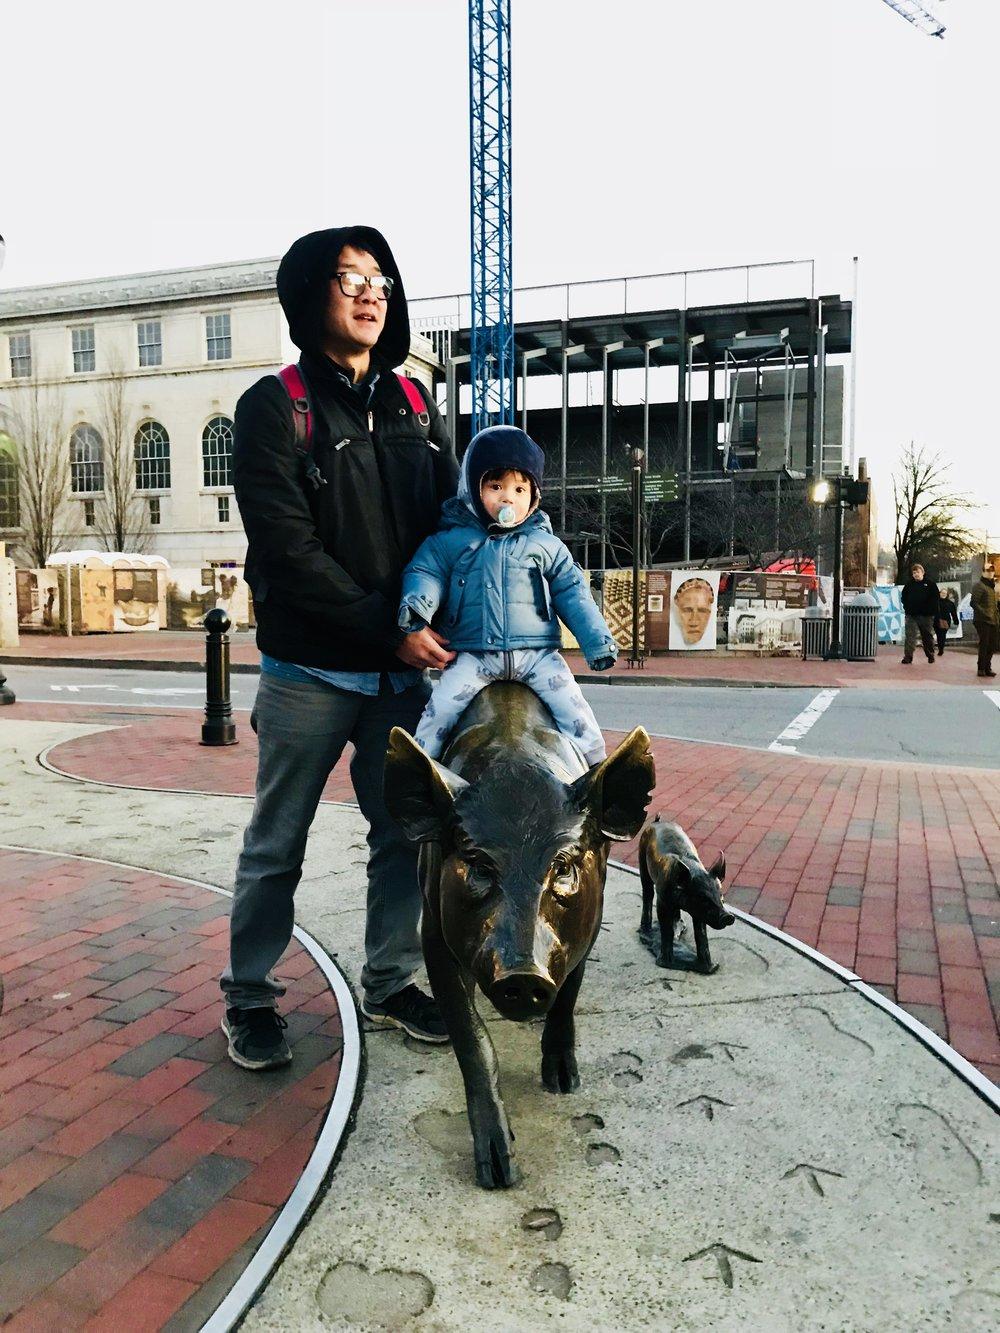 crossroads station pig sculpture - Asheville, nc